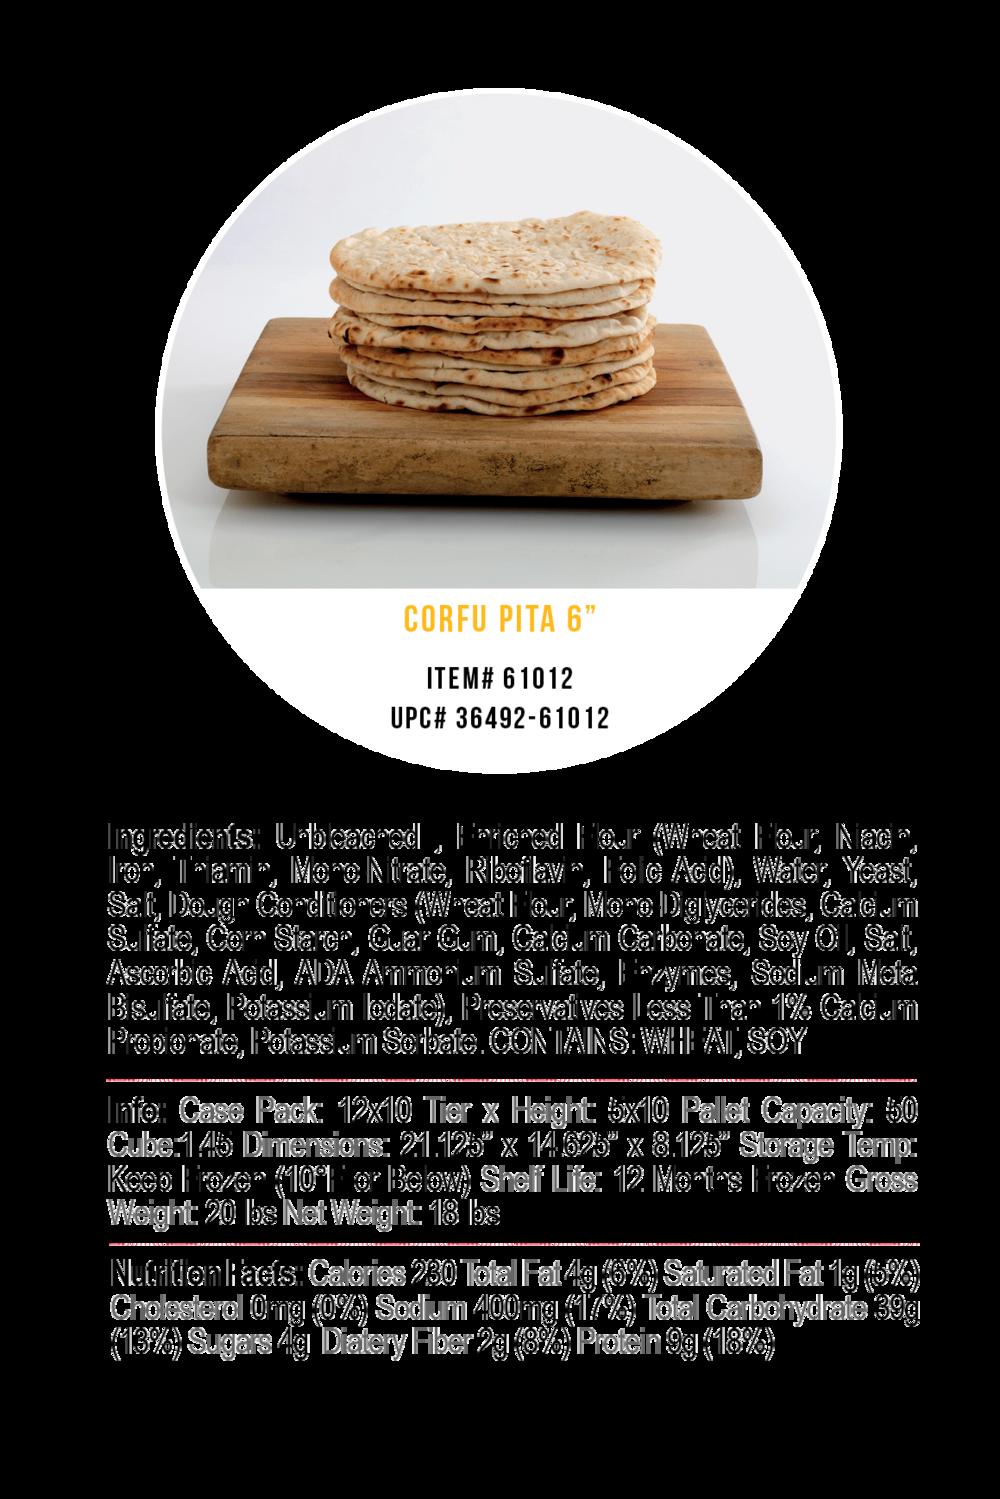 corfu-pita-breads-6 in.png